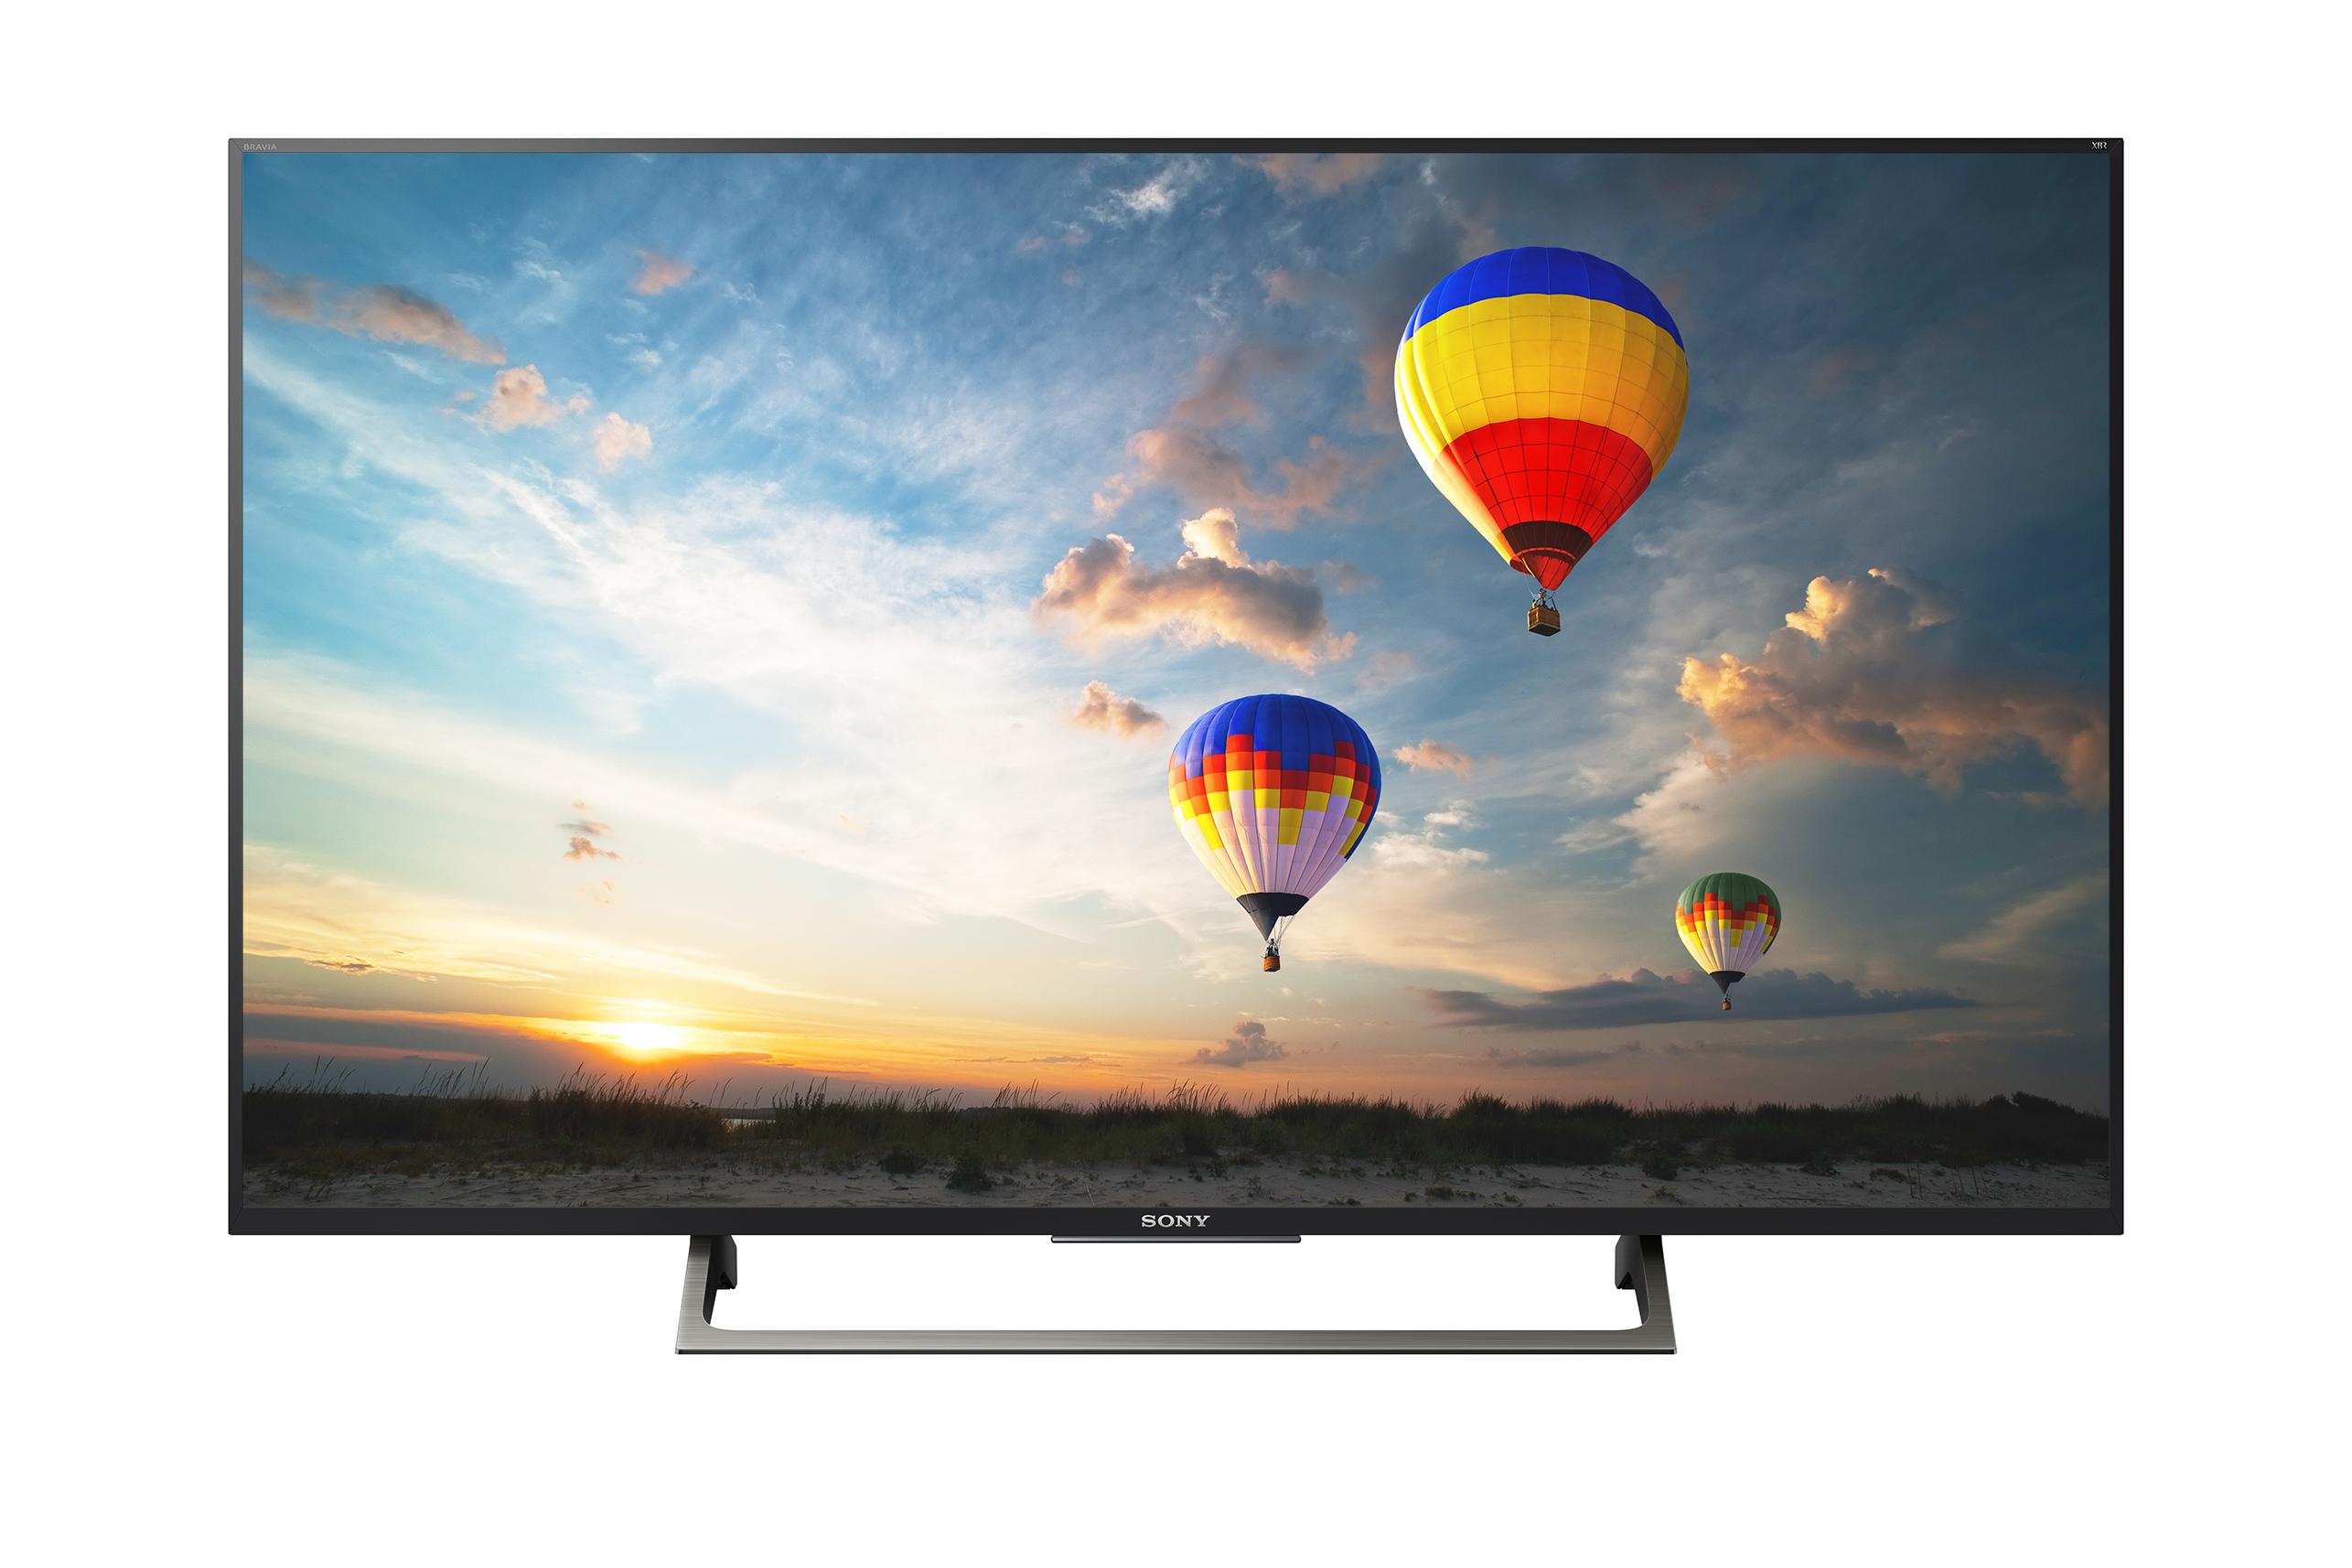 Sony BRAVIA KDL-40HX725 HDTV Driver Download